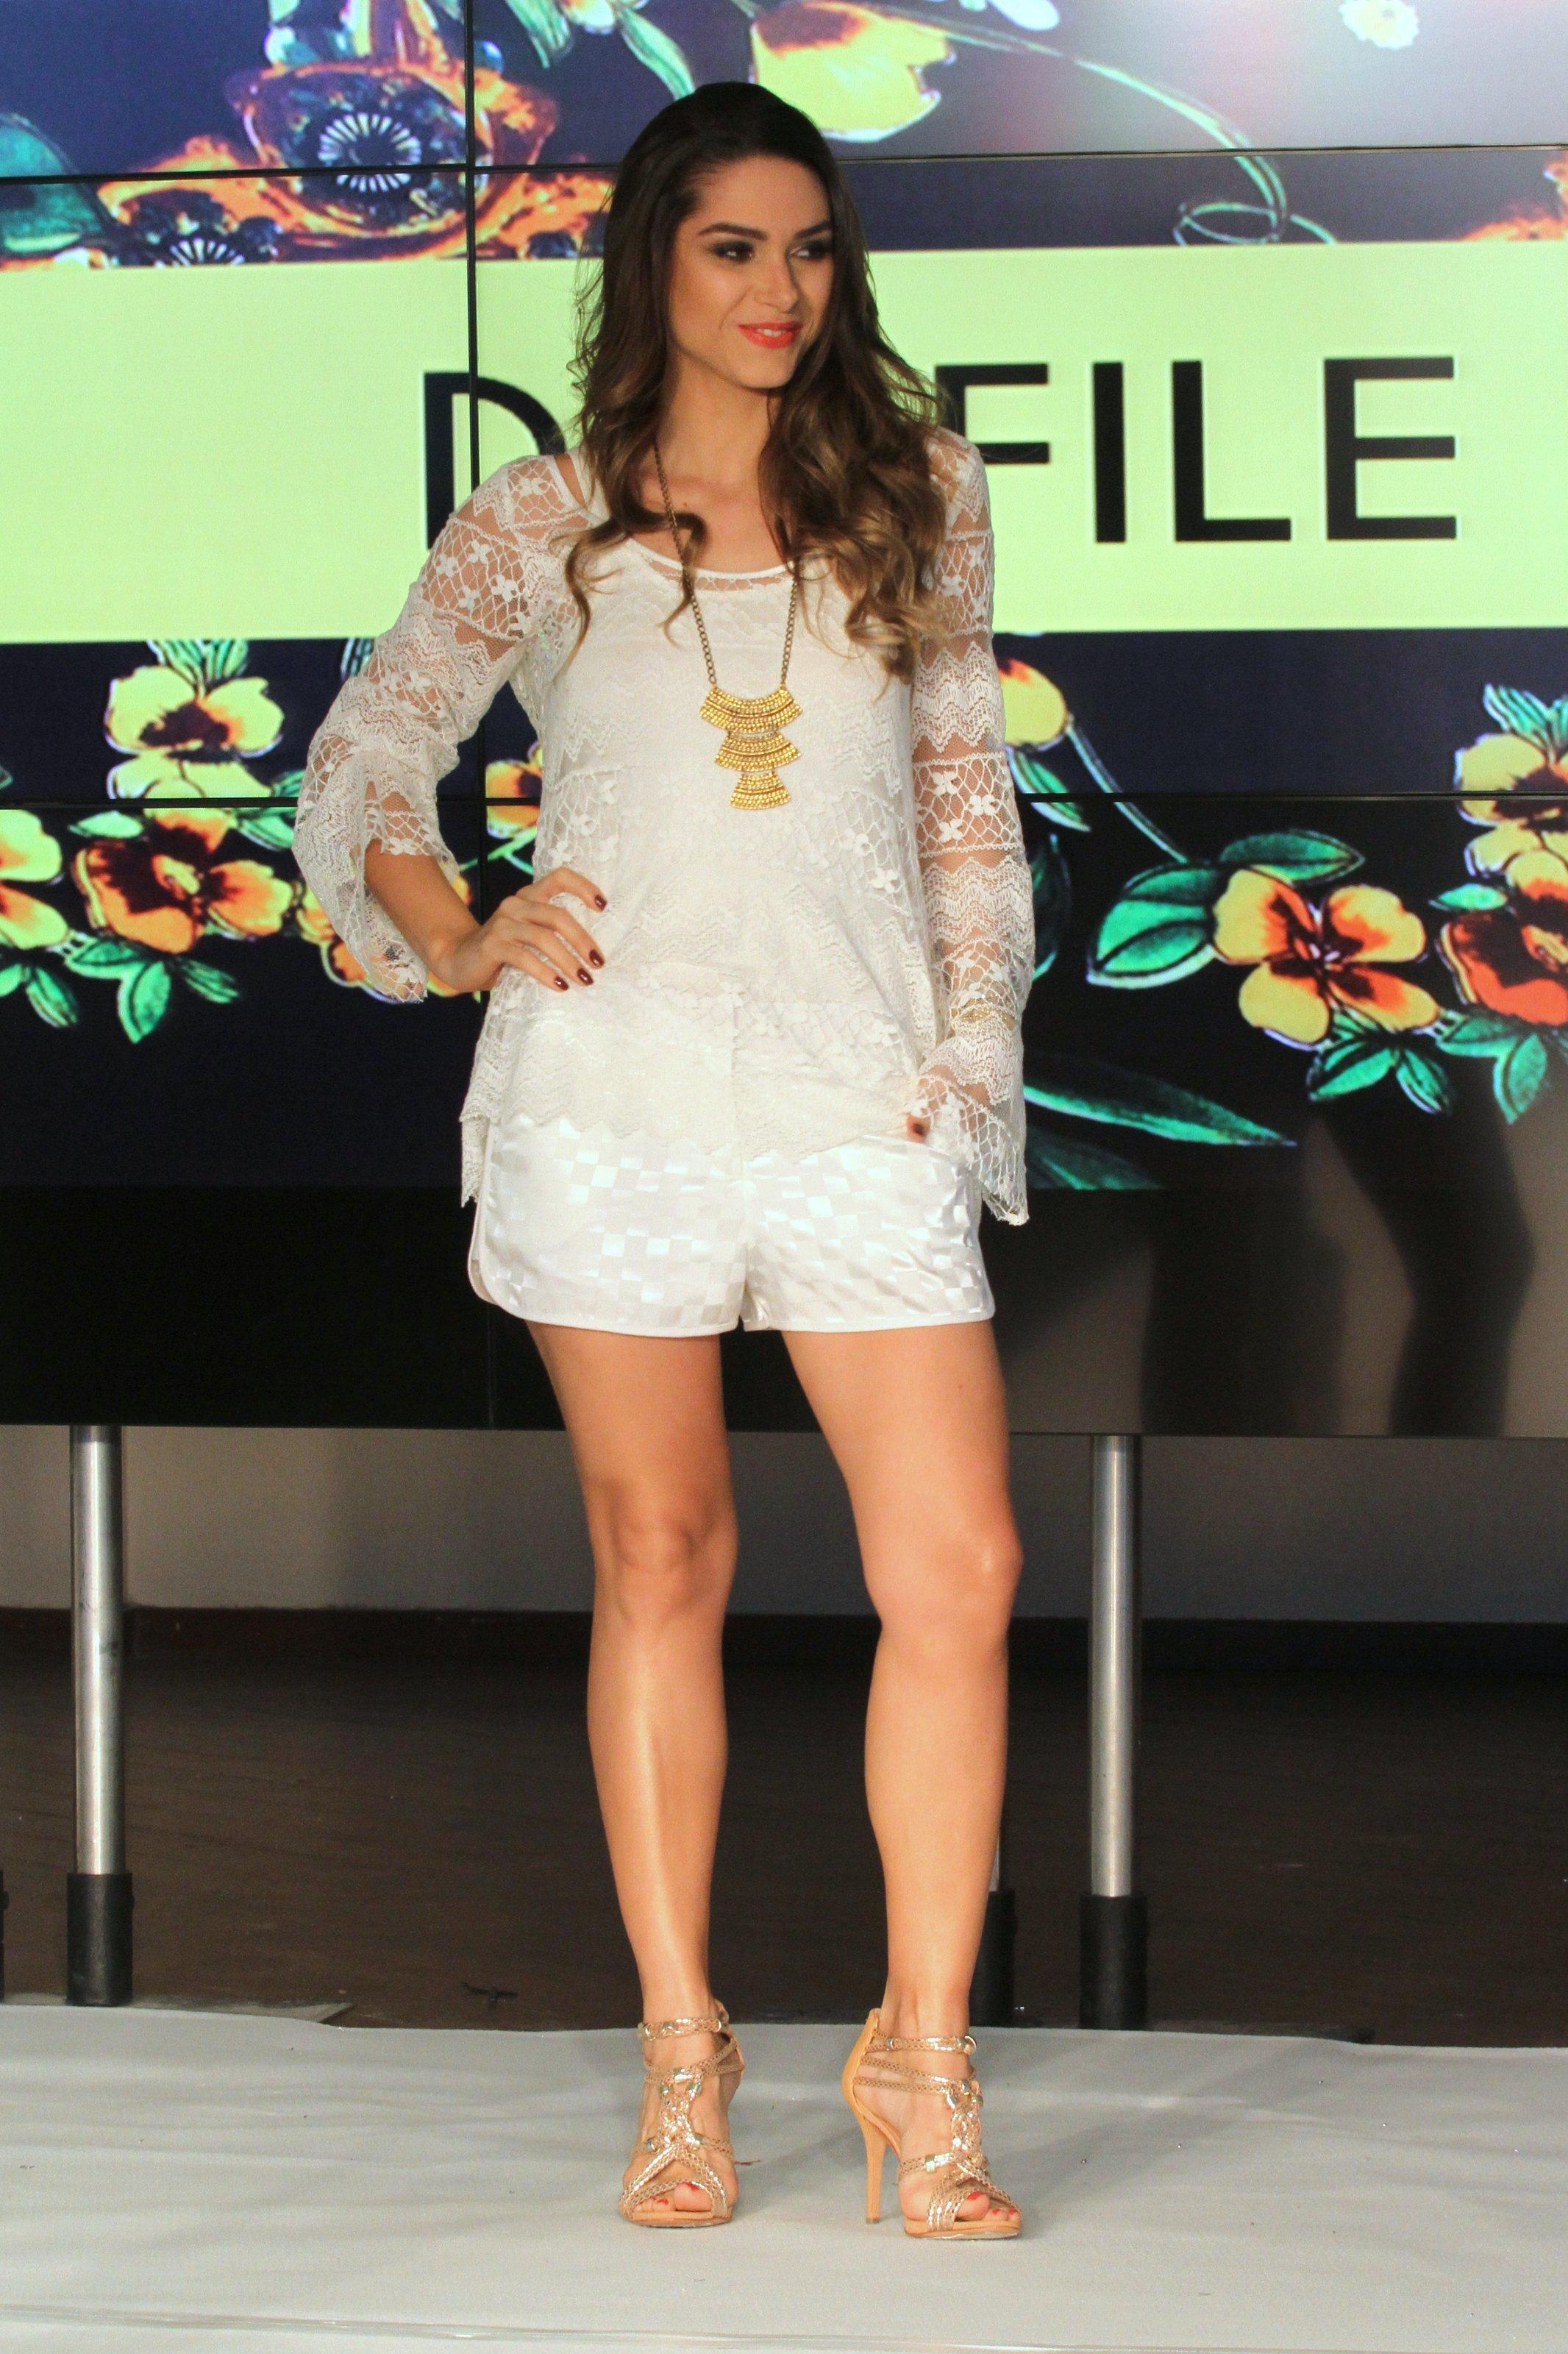 http://pics.wikifeet.com/Fernanda-Machado-Feet-1276722.jpg